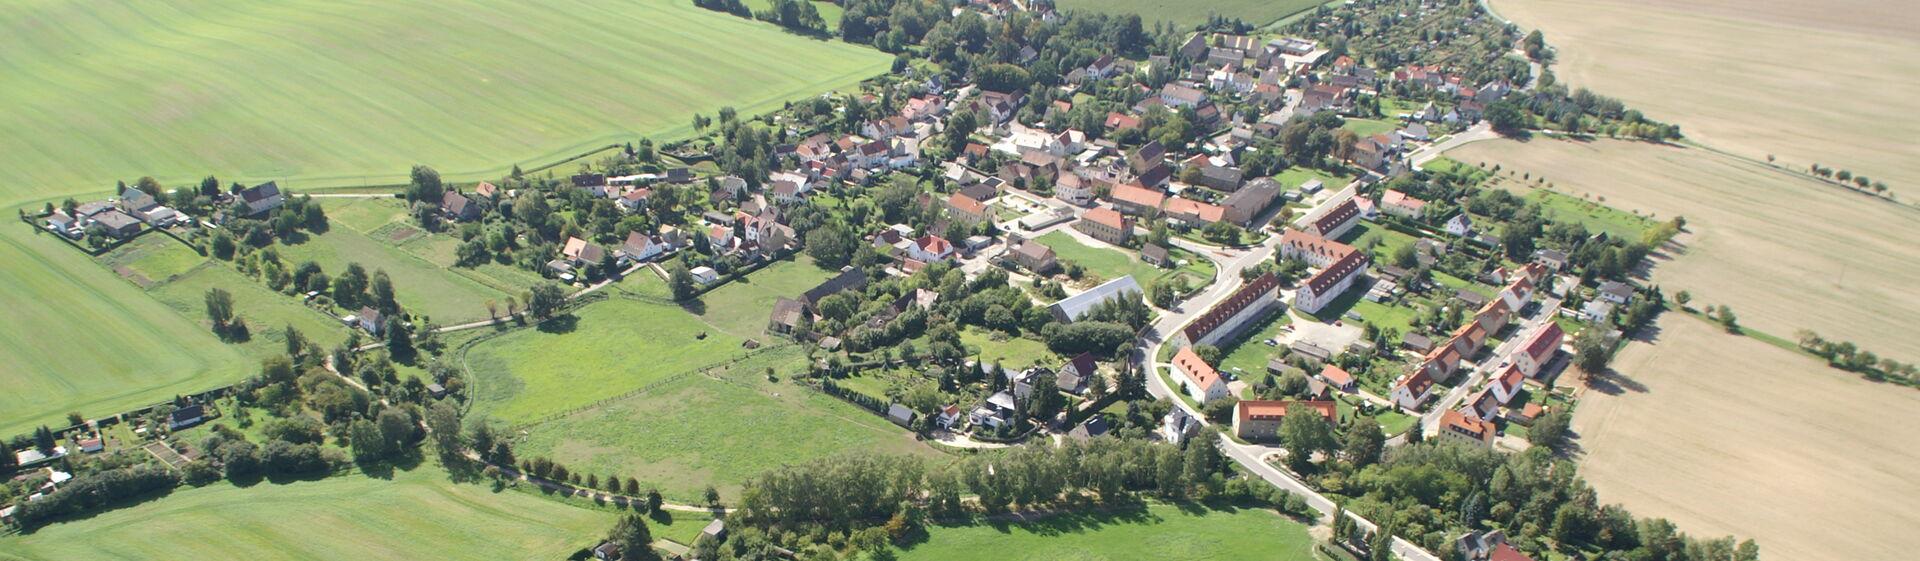 Gemeinde Kriebitzsch